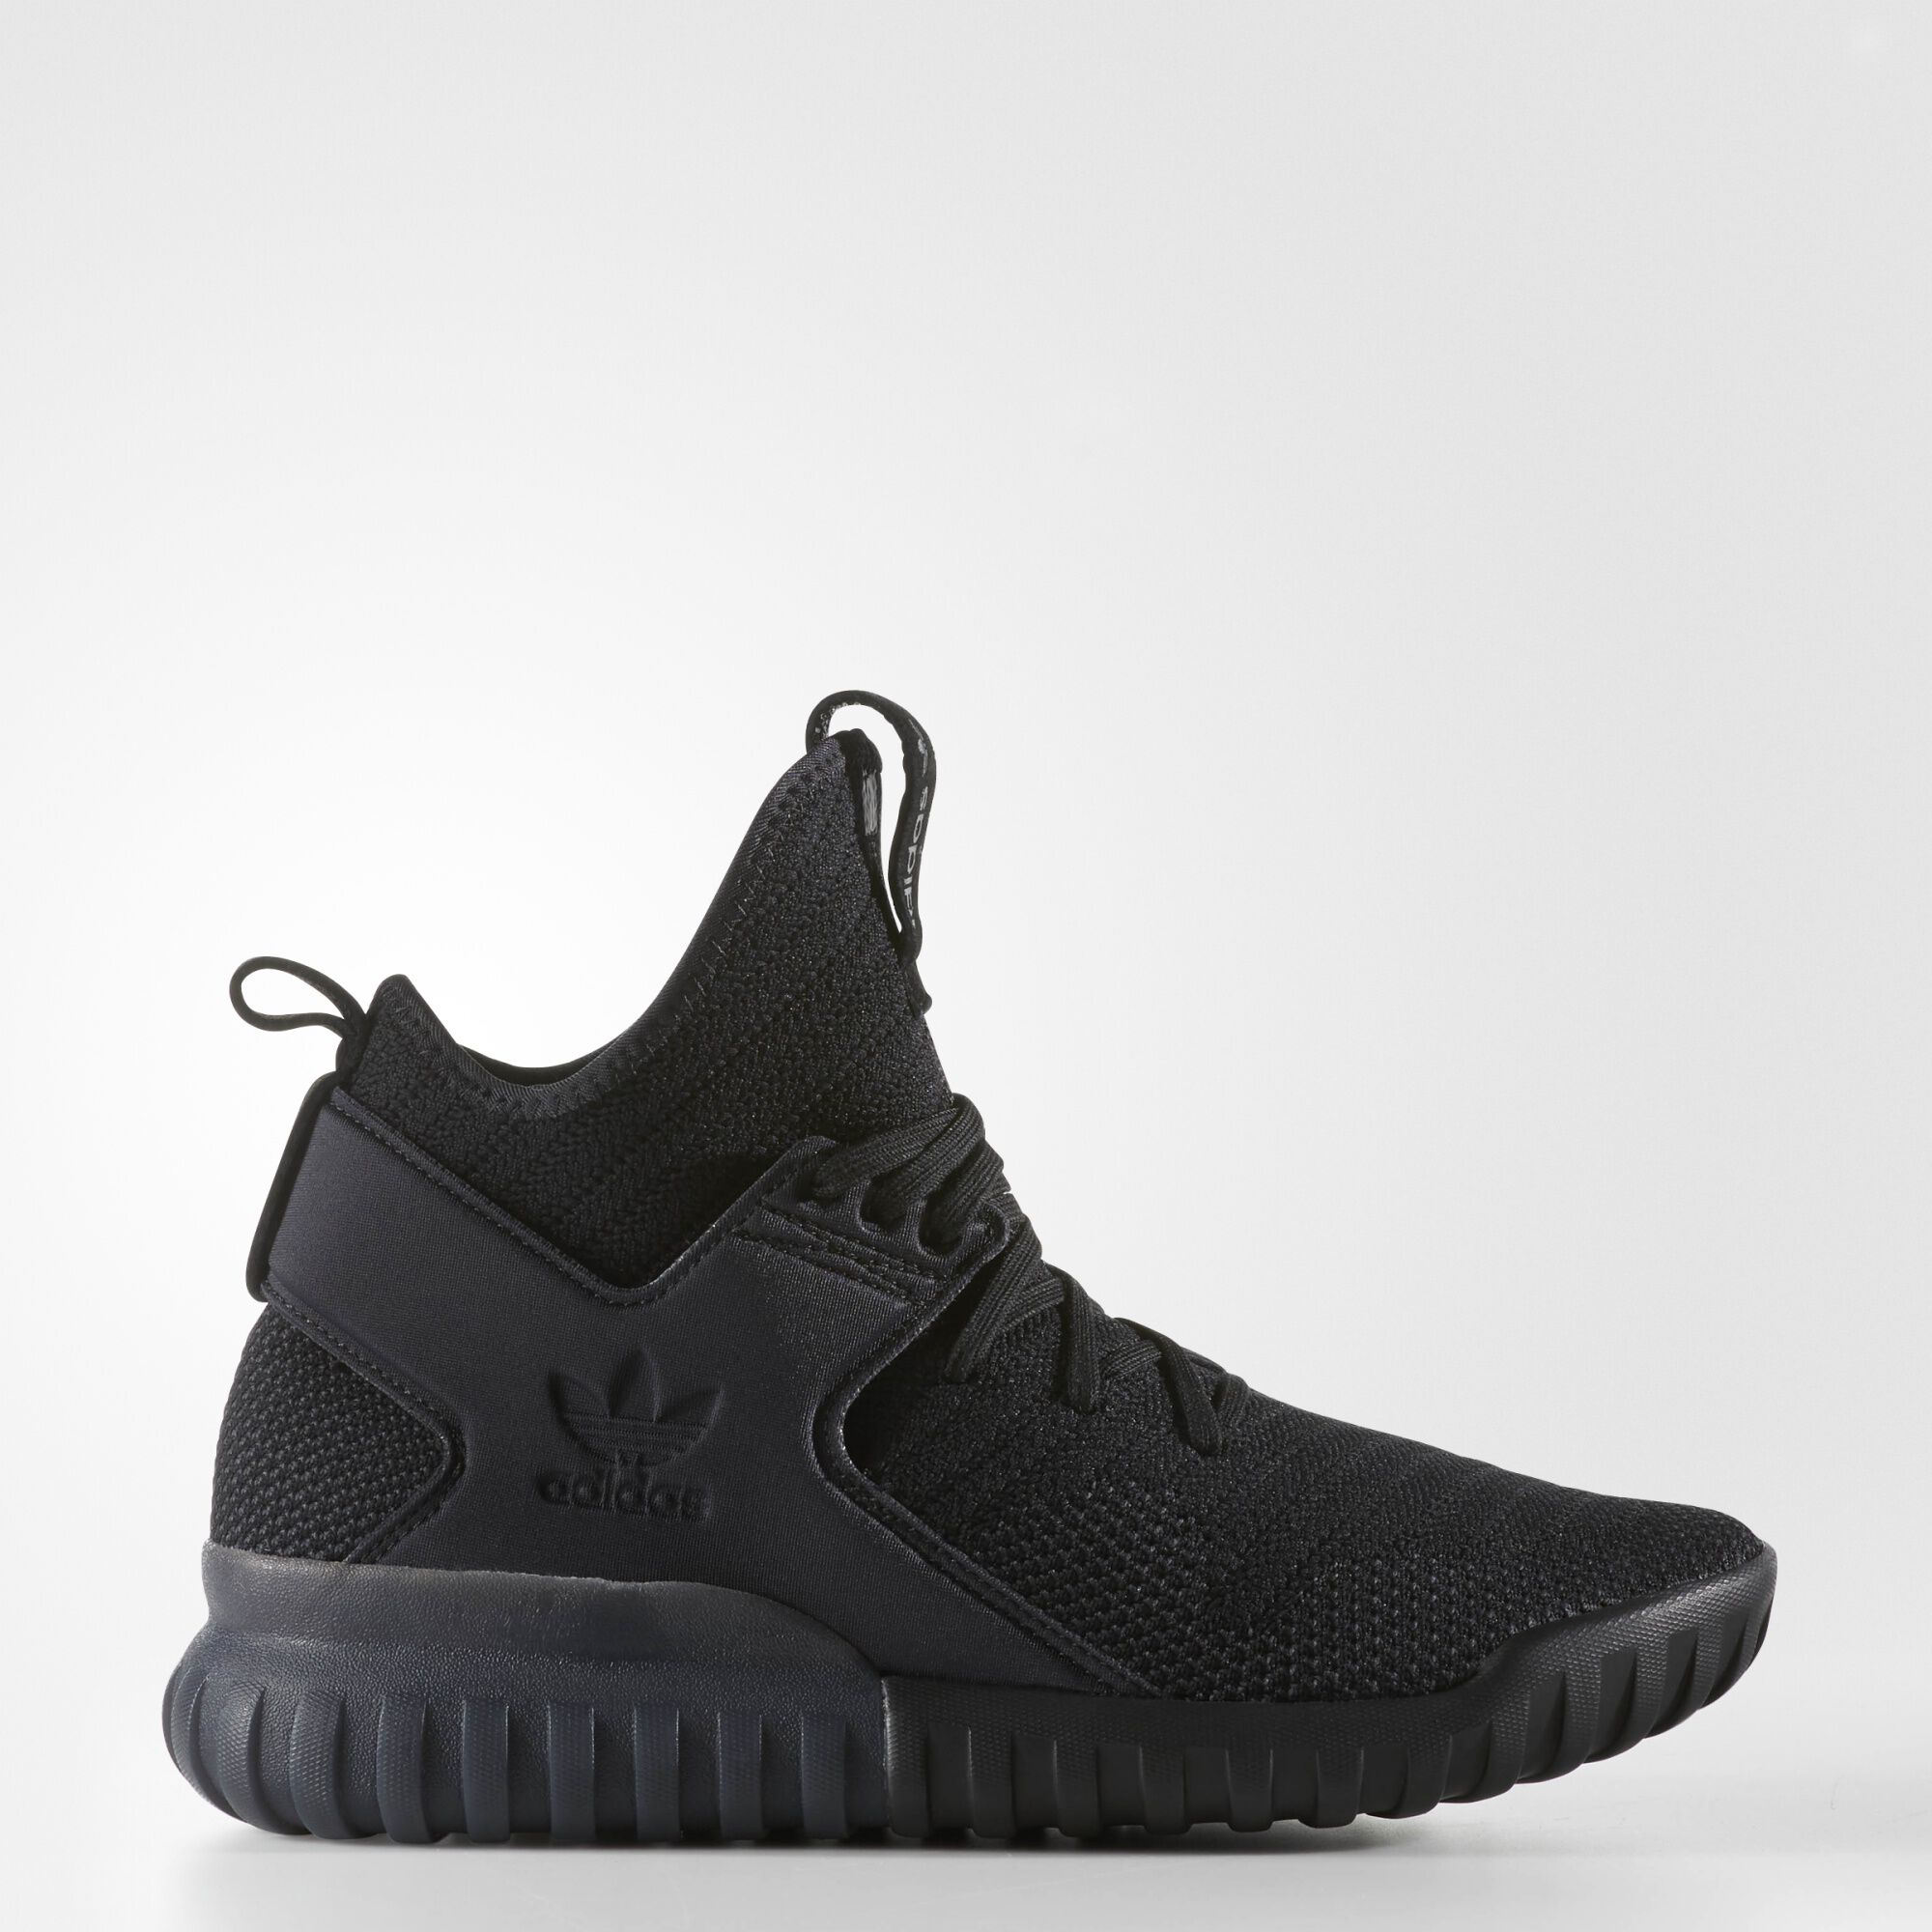 adidas Tubular X Primeknit Shoes